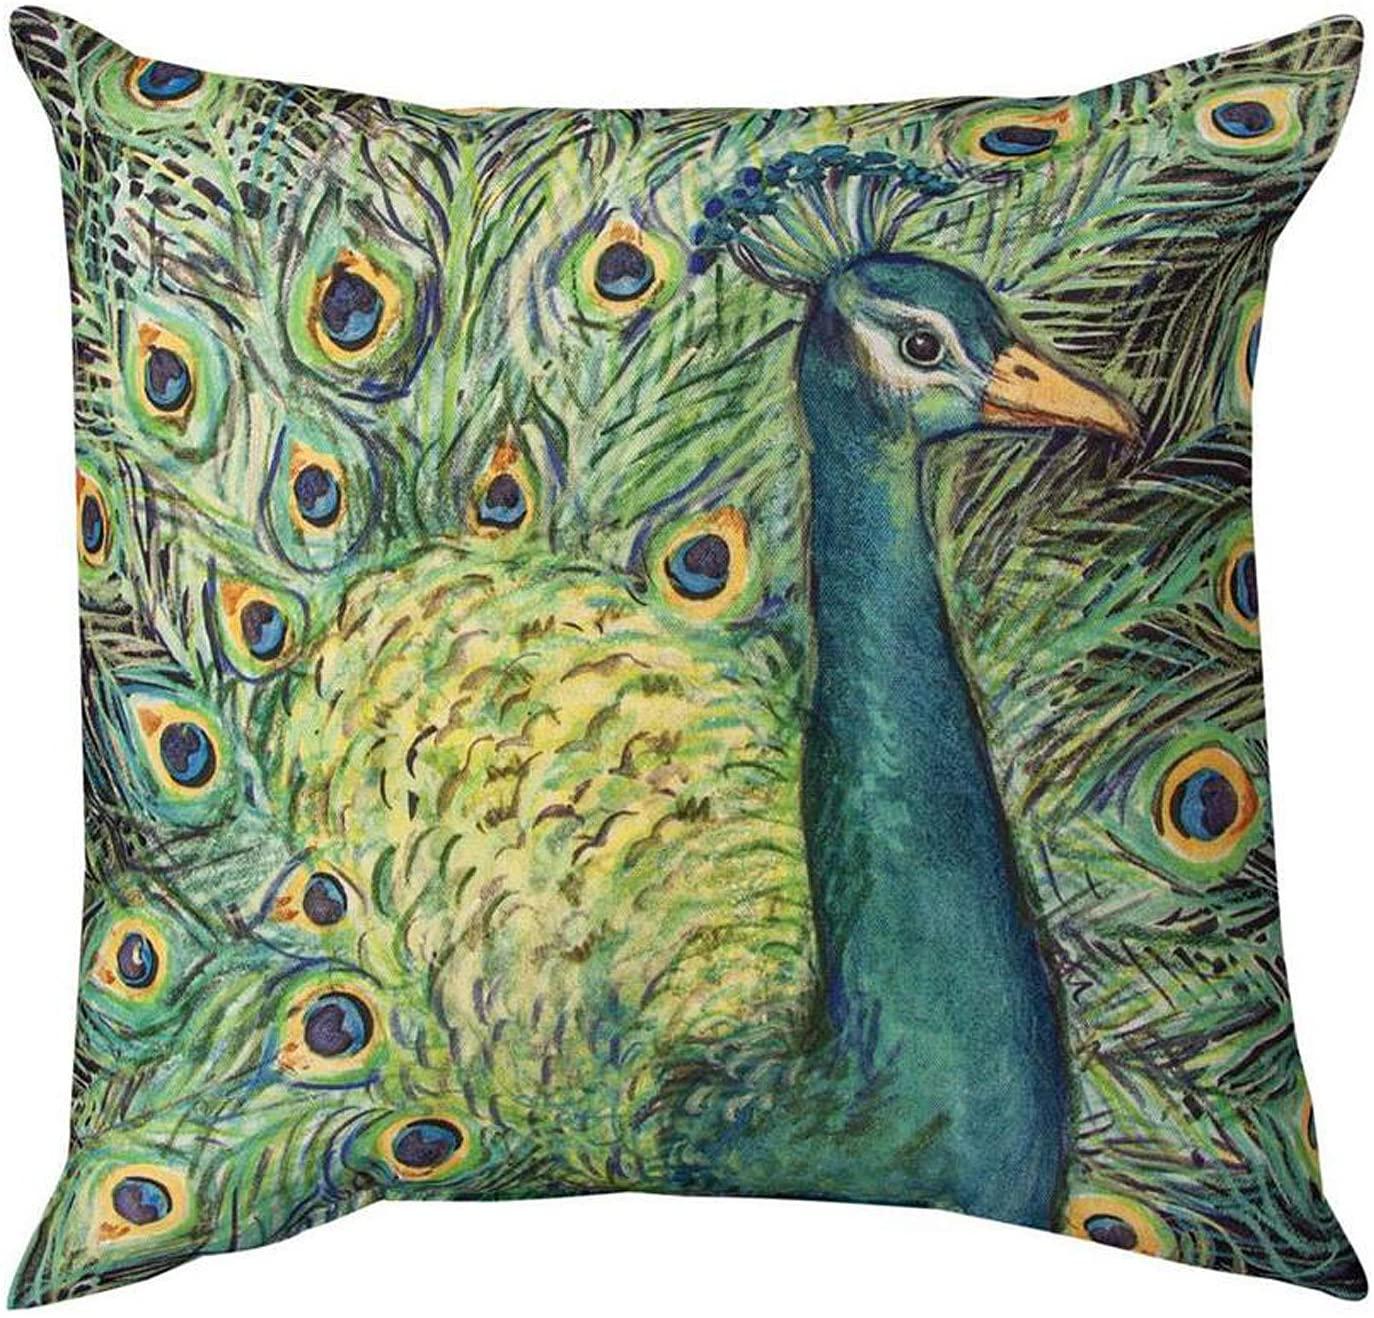 KensingtonRow Home Collection Throw Pillows - Majestic Peacock Indoor Outdoor Pillow - 18